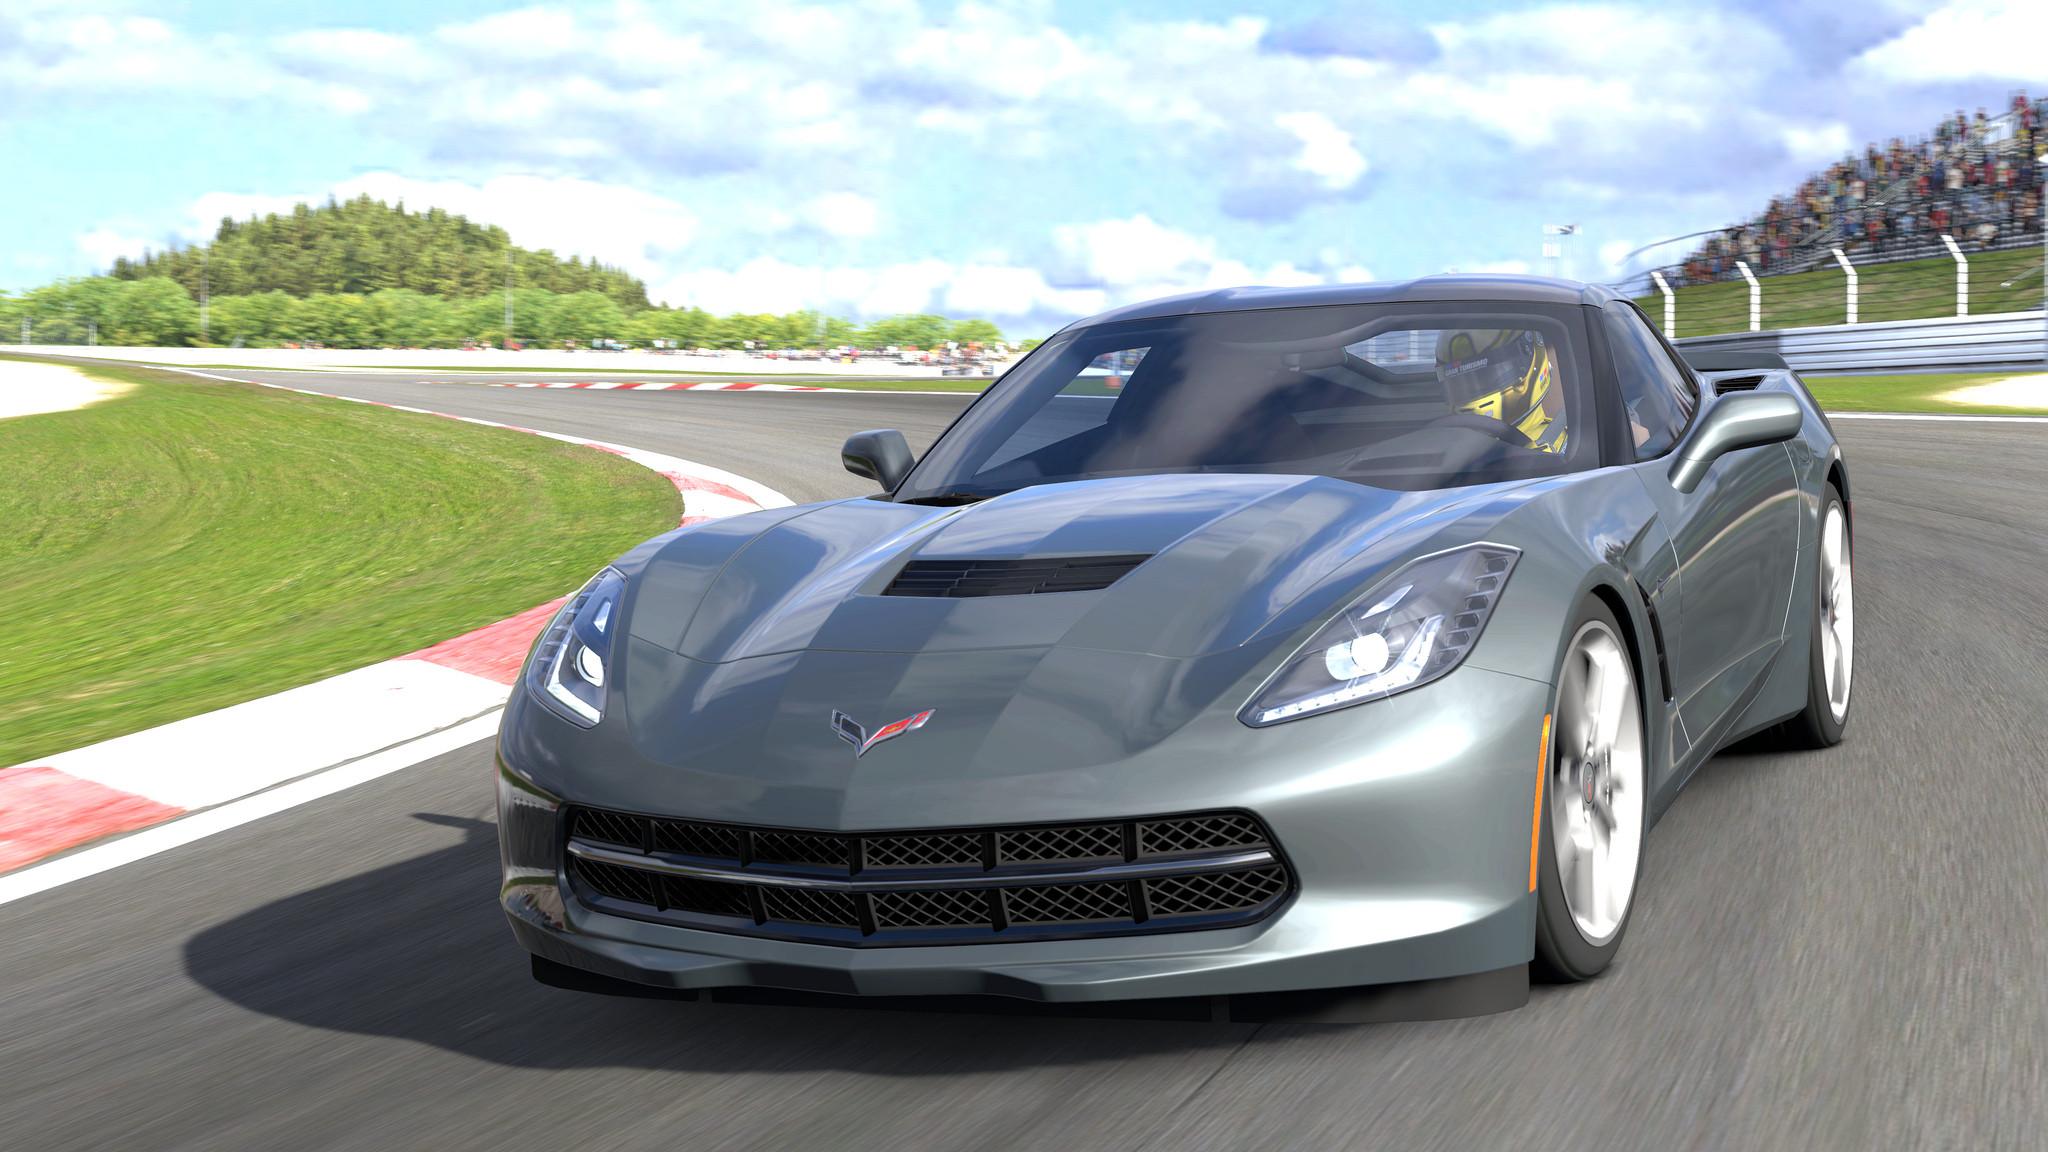 2014 Corvette c7 images desktop Background HD Wallpaper for Desktop 2048x1152